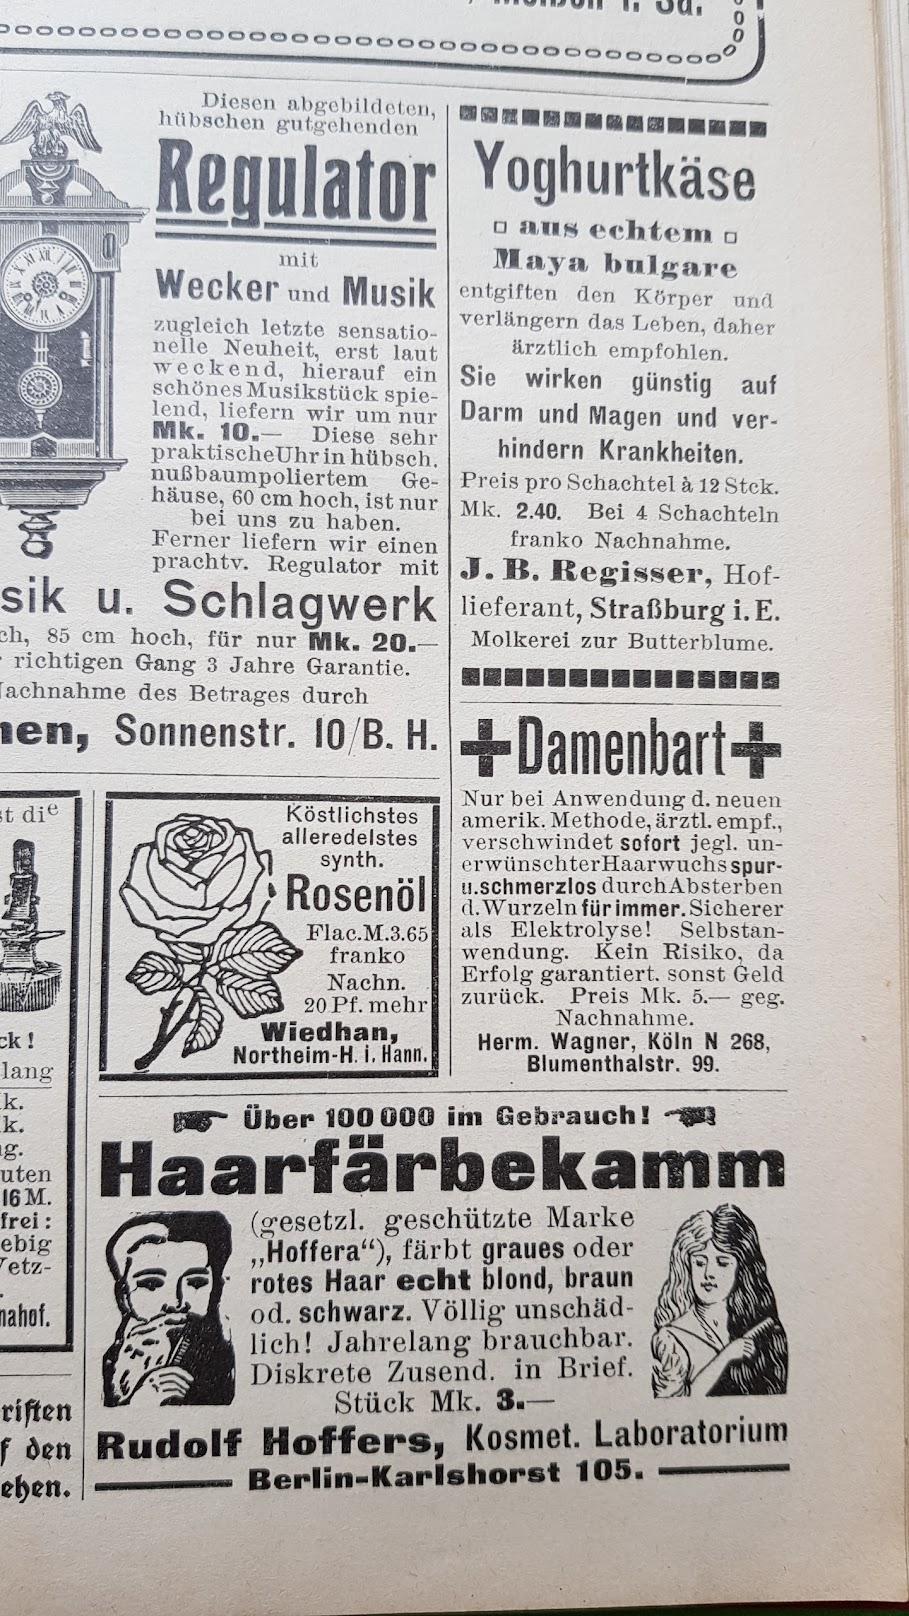 Großer Volkskalender des Lahrer hinkenden Boten - 1914 - Werbung